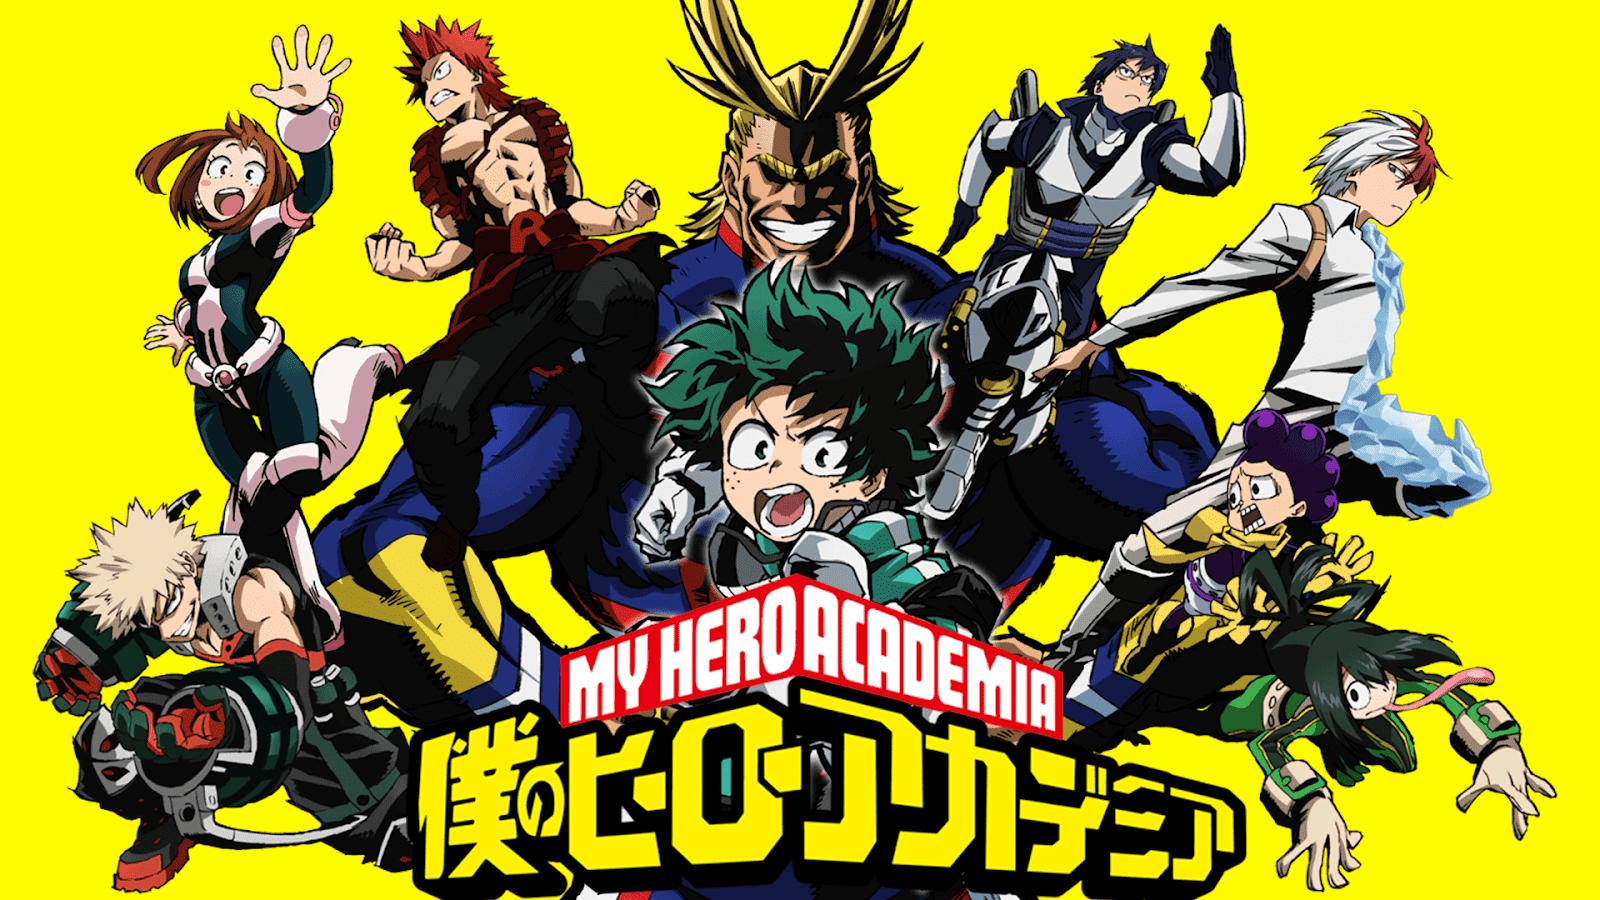 My Hero Academia (僕のヒーローアカデミア)